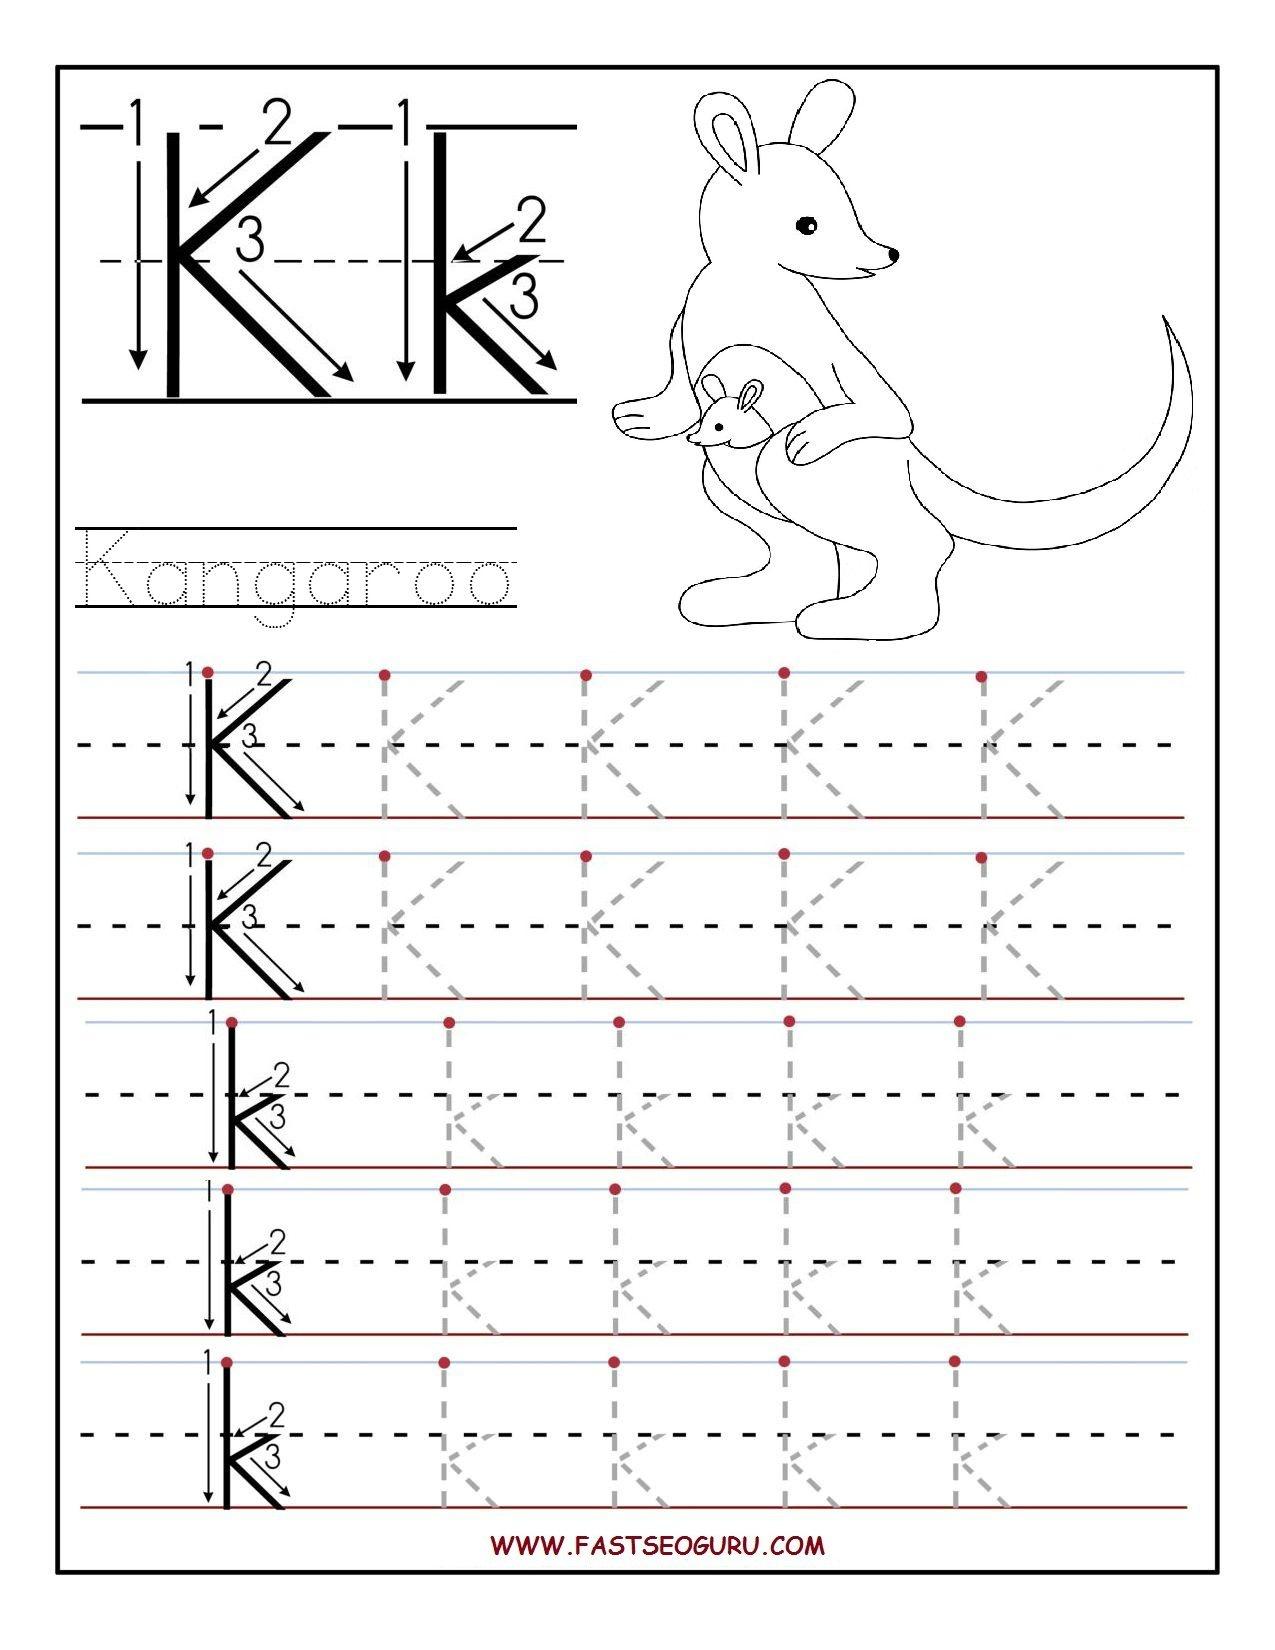 Printable Letter K Tracing Worksheets For Preschool | Learning - Free Printable Letter K Worksheets